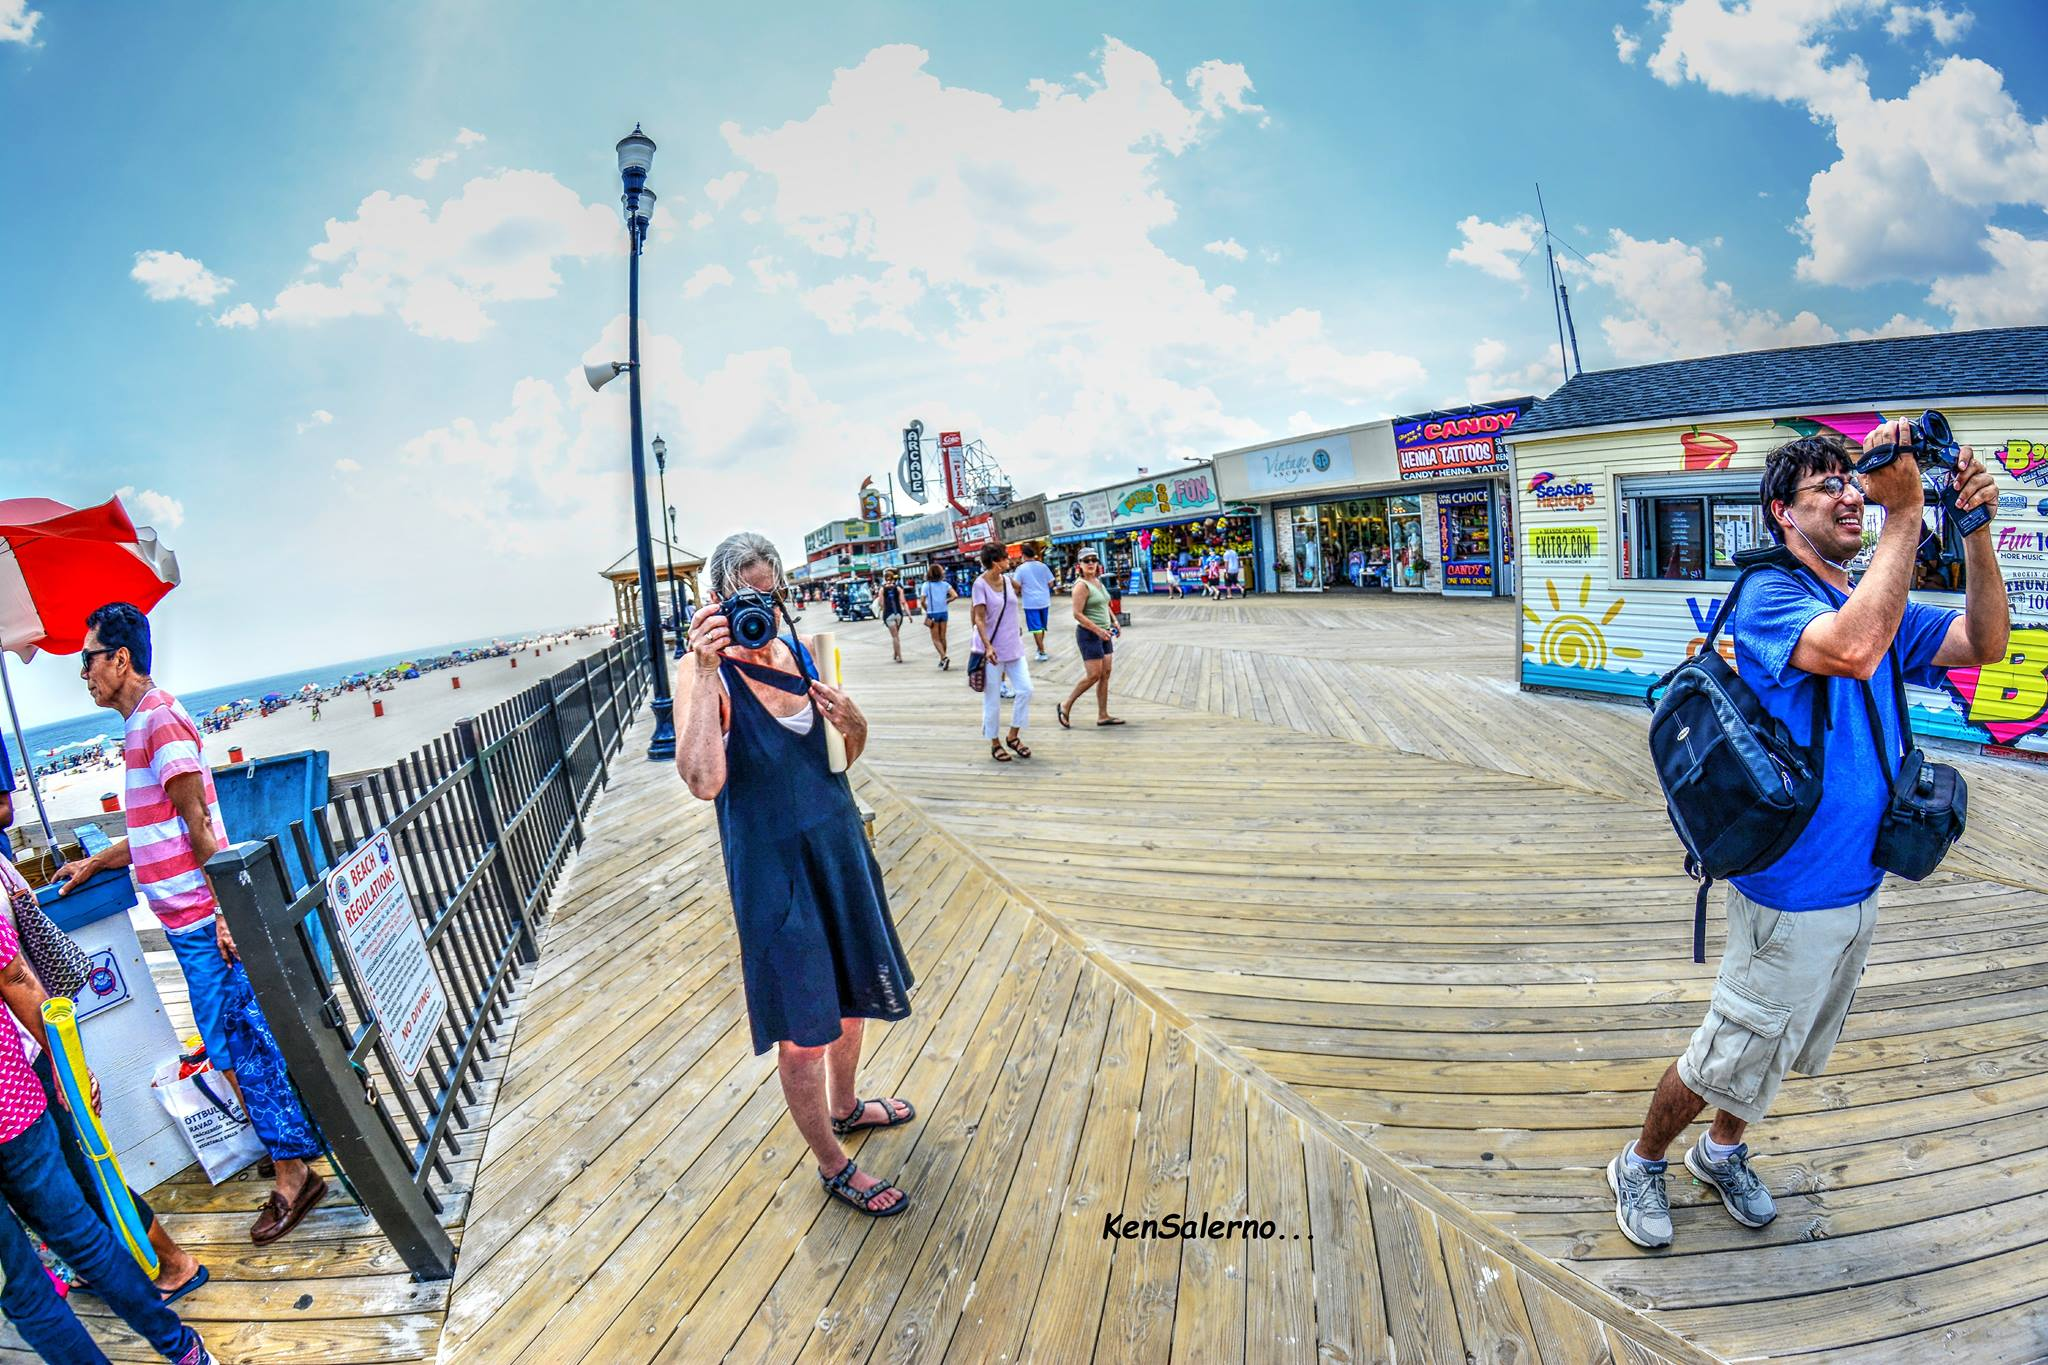 tinaandlennononboardwalk